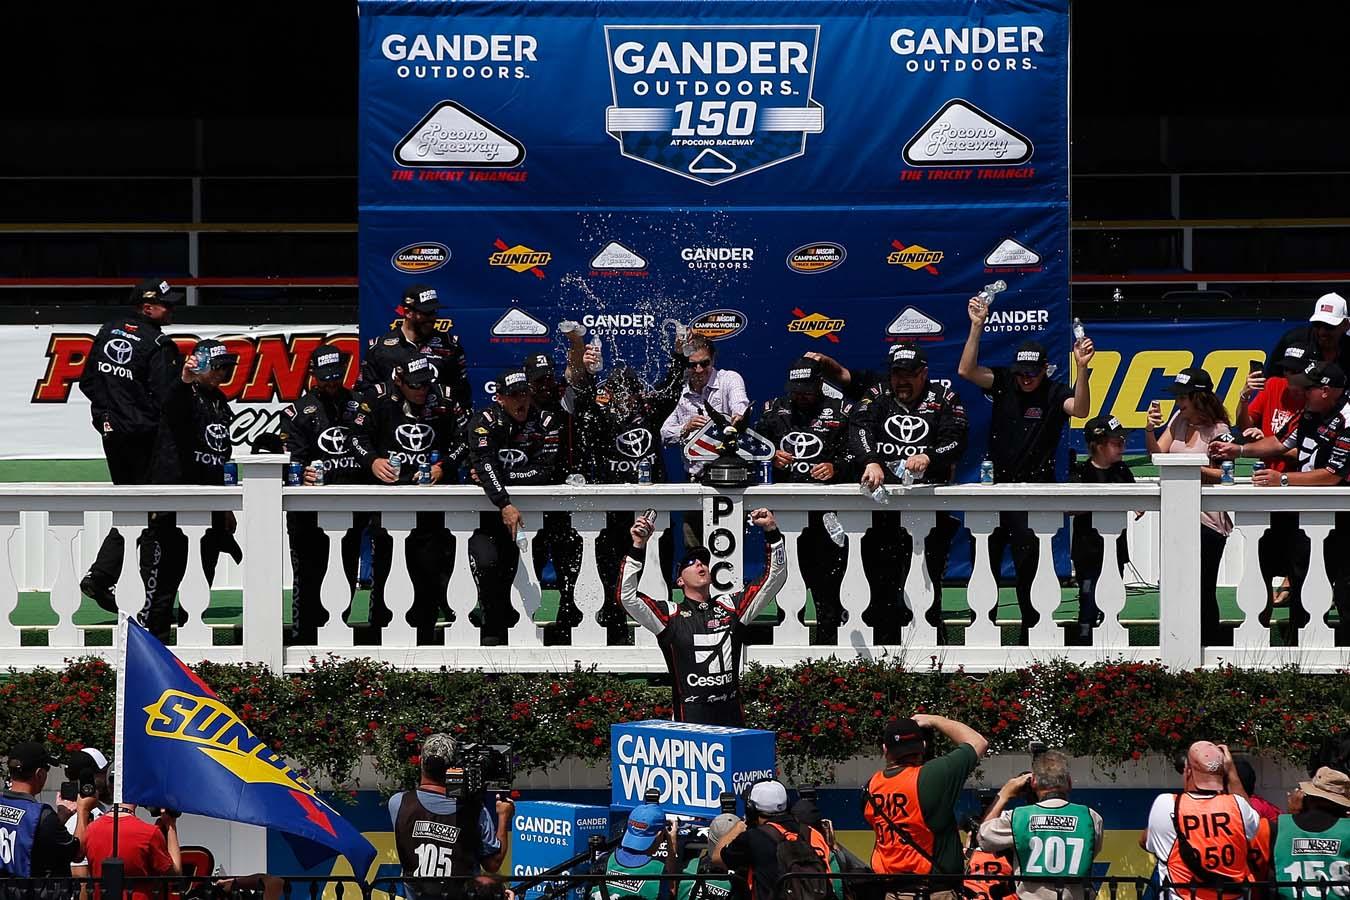 NASCAR Camping World Truck Series Gander Outdoors 150